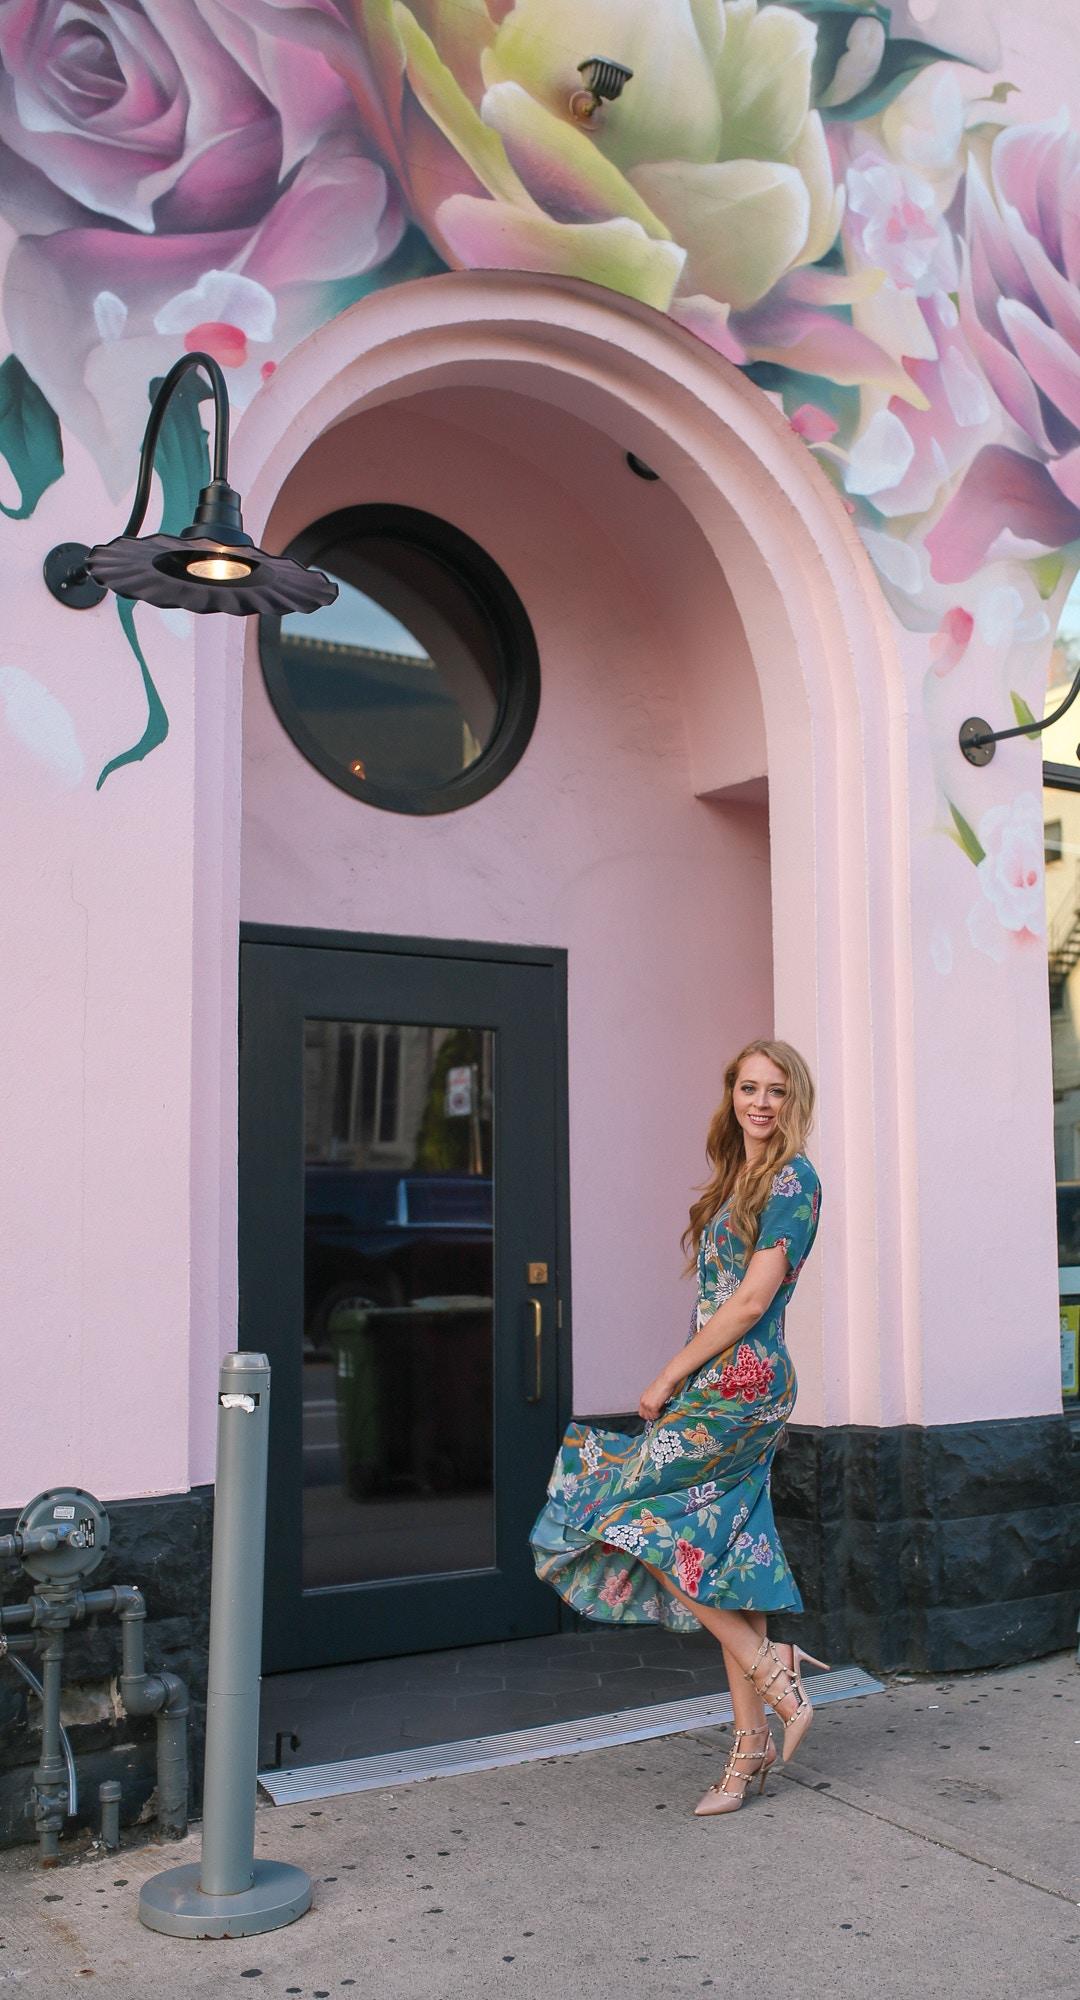 Piano Piano Toronto restaurant with pink rose murals